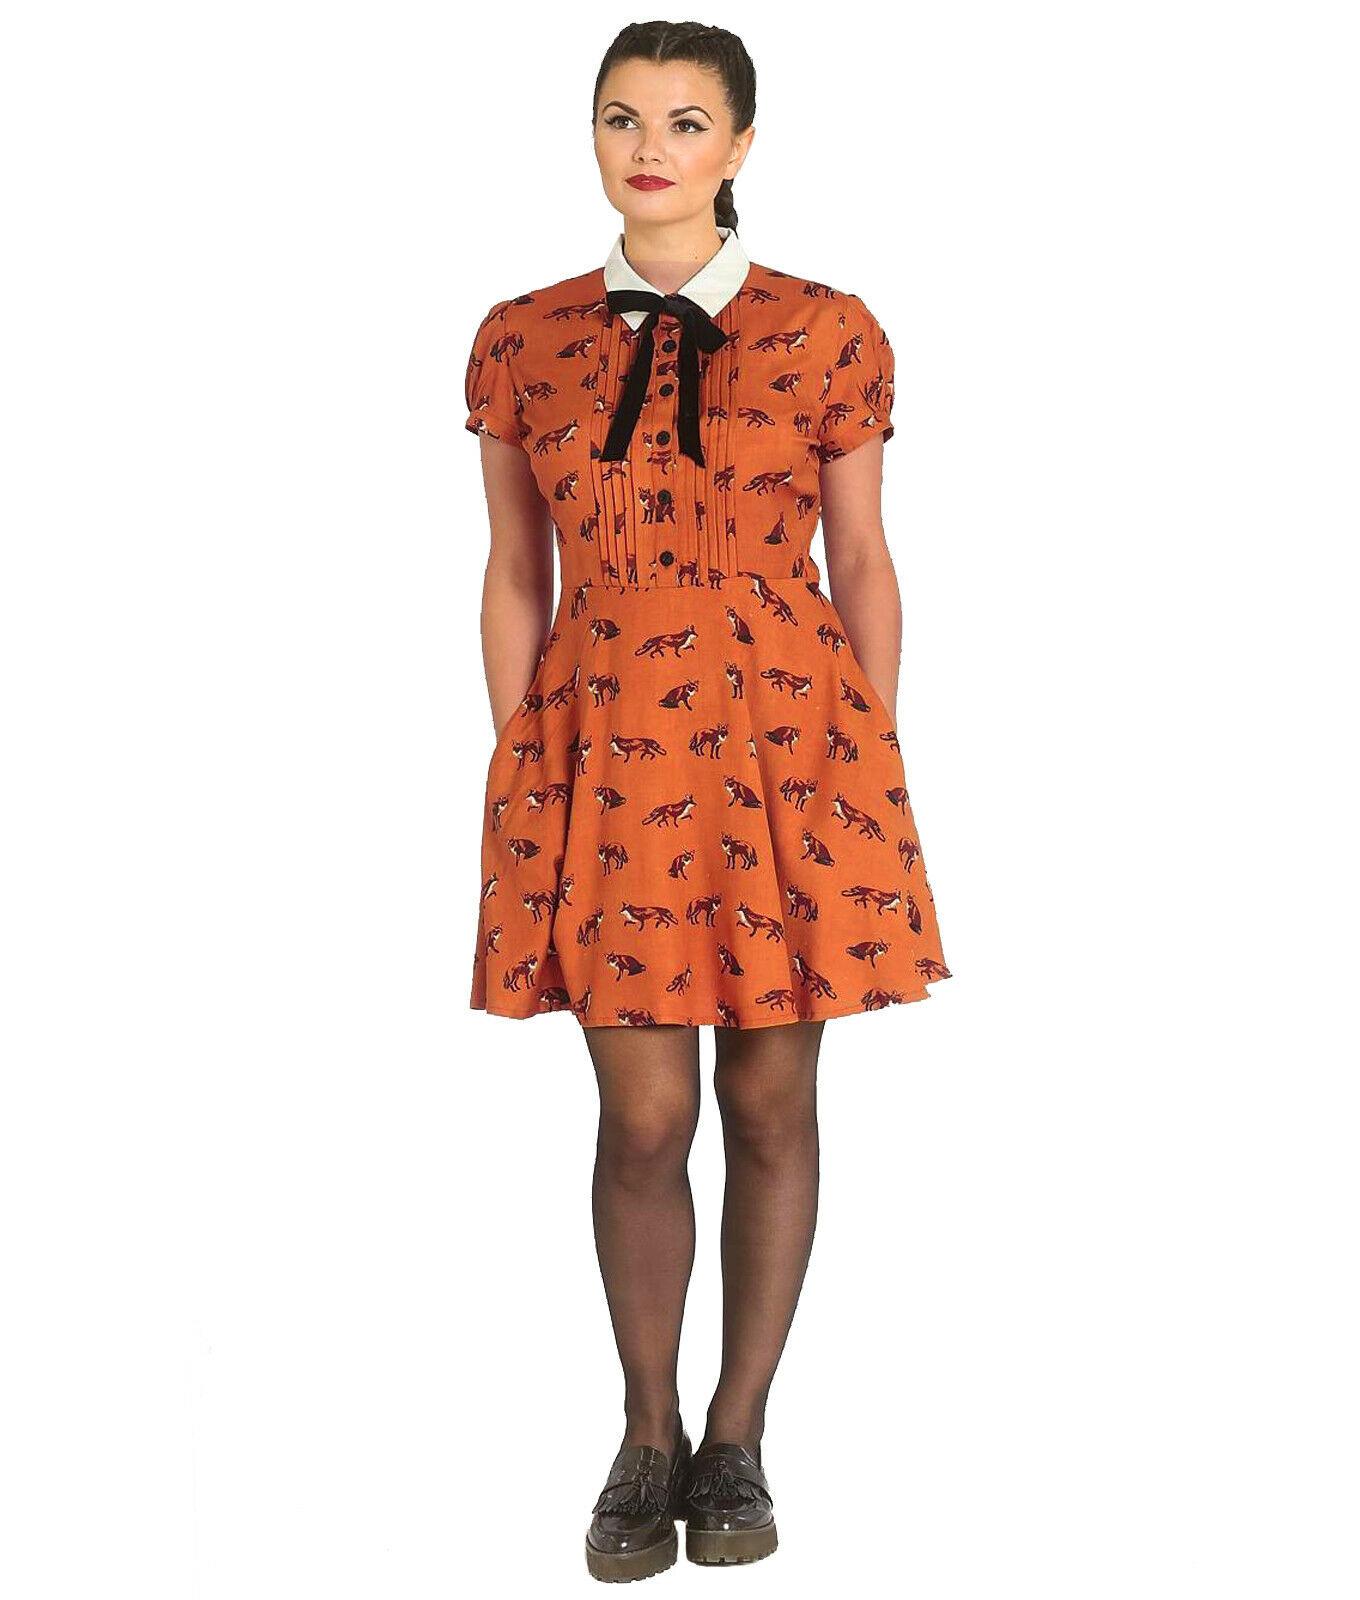 Hell-Bunny-40s-50s-Brown-Mini-Dress-Pin-Up-VIXEY-Vixen-Fox-Print-All-Sizes thumbnail 17